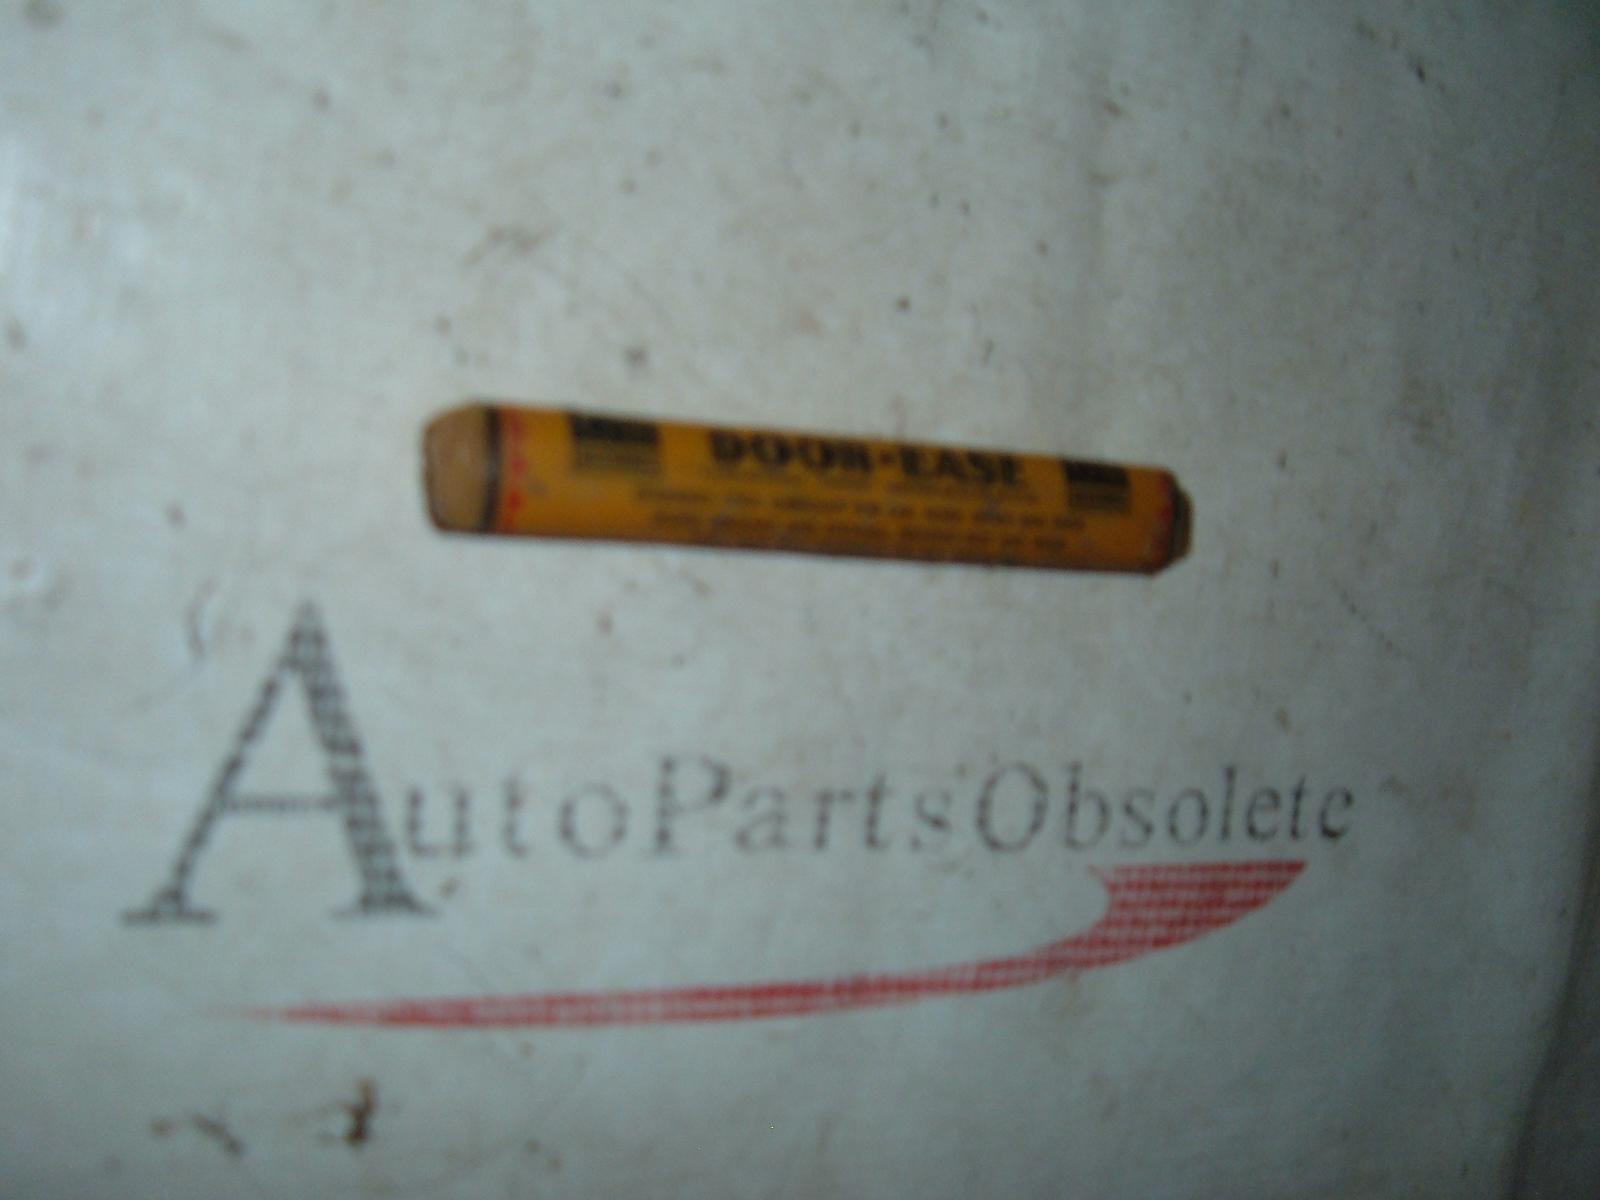 1940 41 42 46 47 48 49 50 cadillac pontiac chevrolet buick oldsmobile door ease lube # 985093 (z 985093)